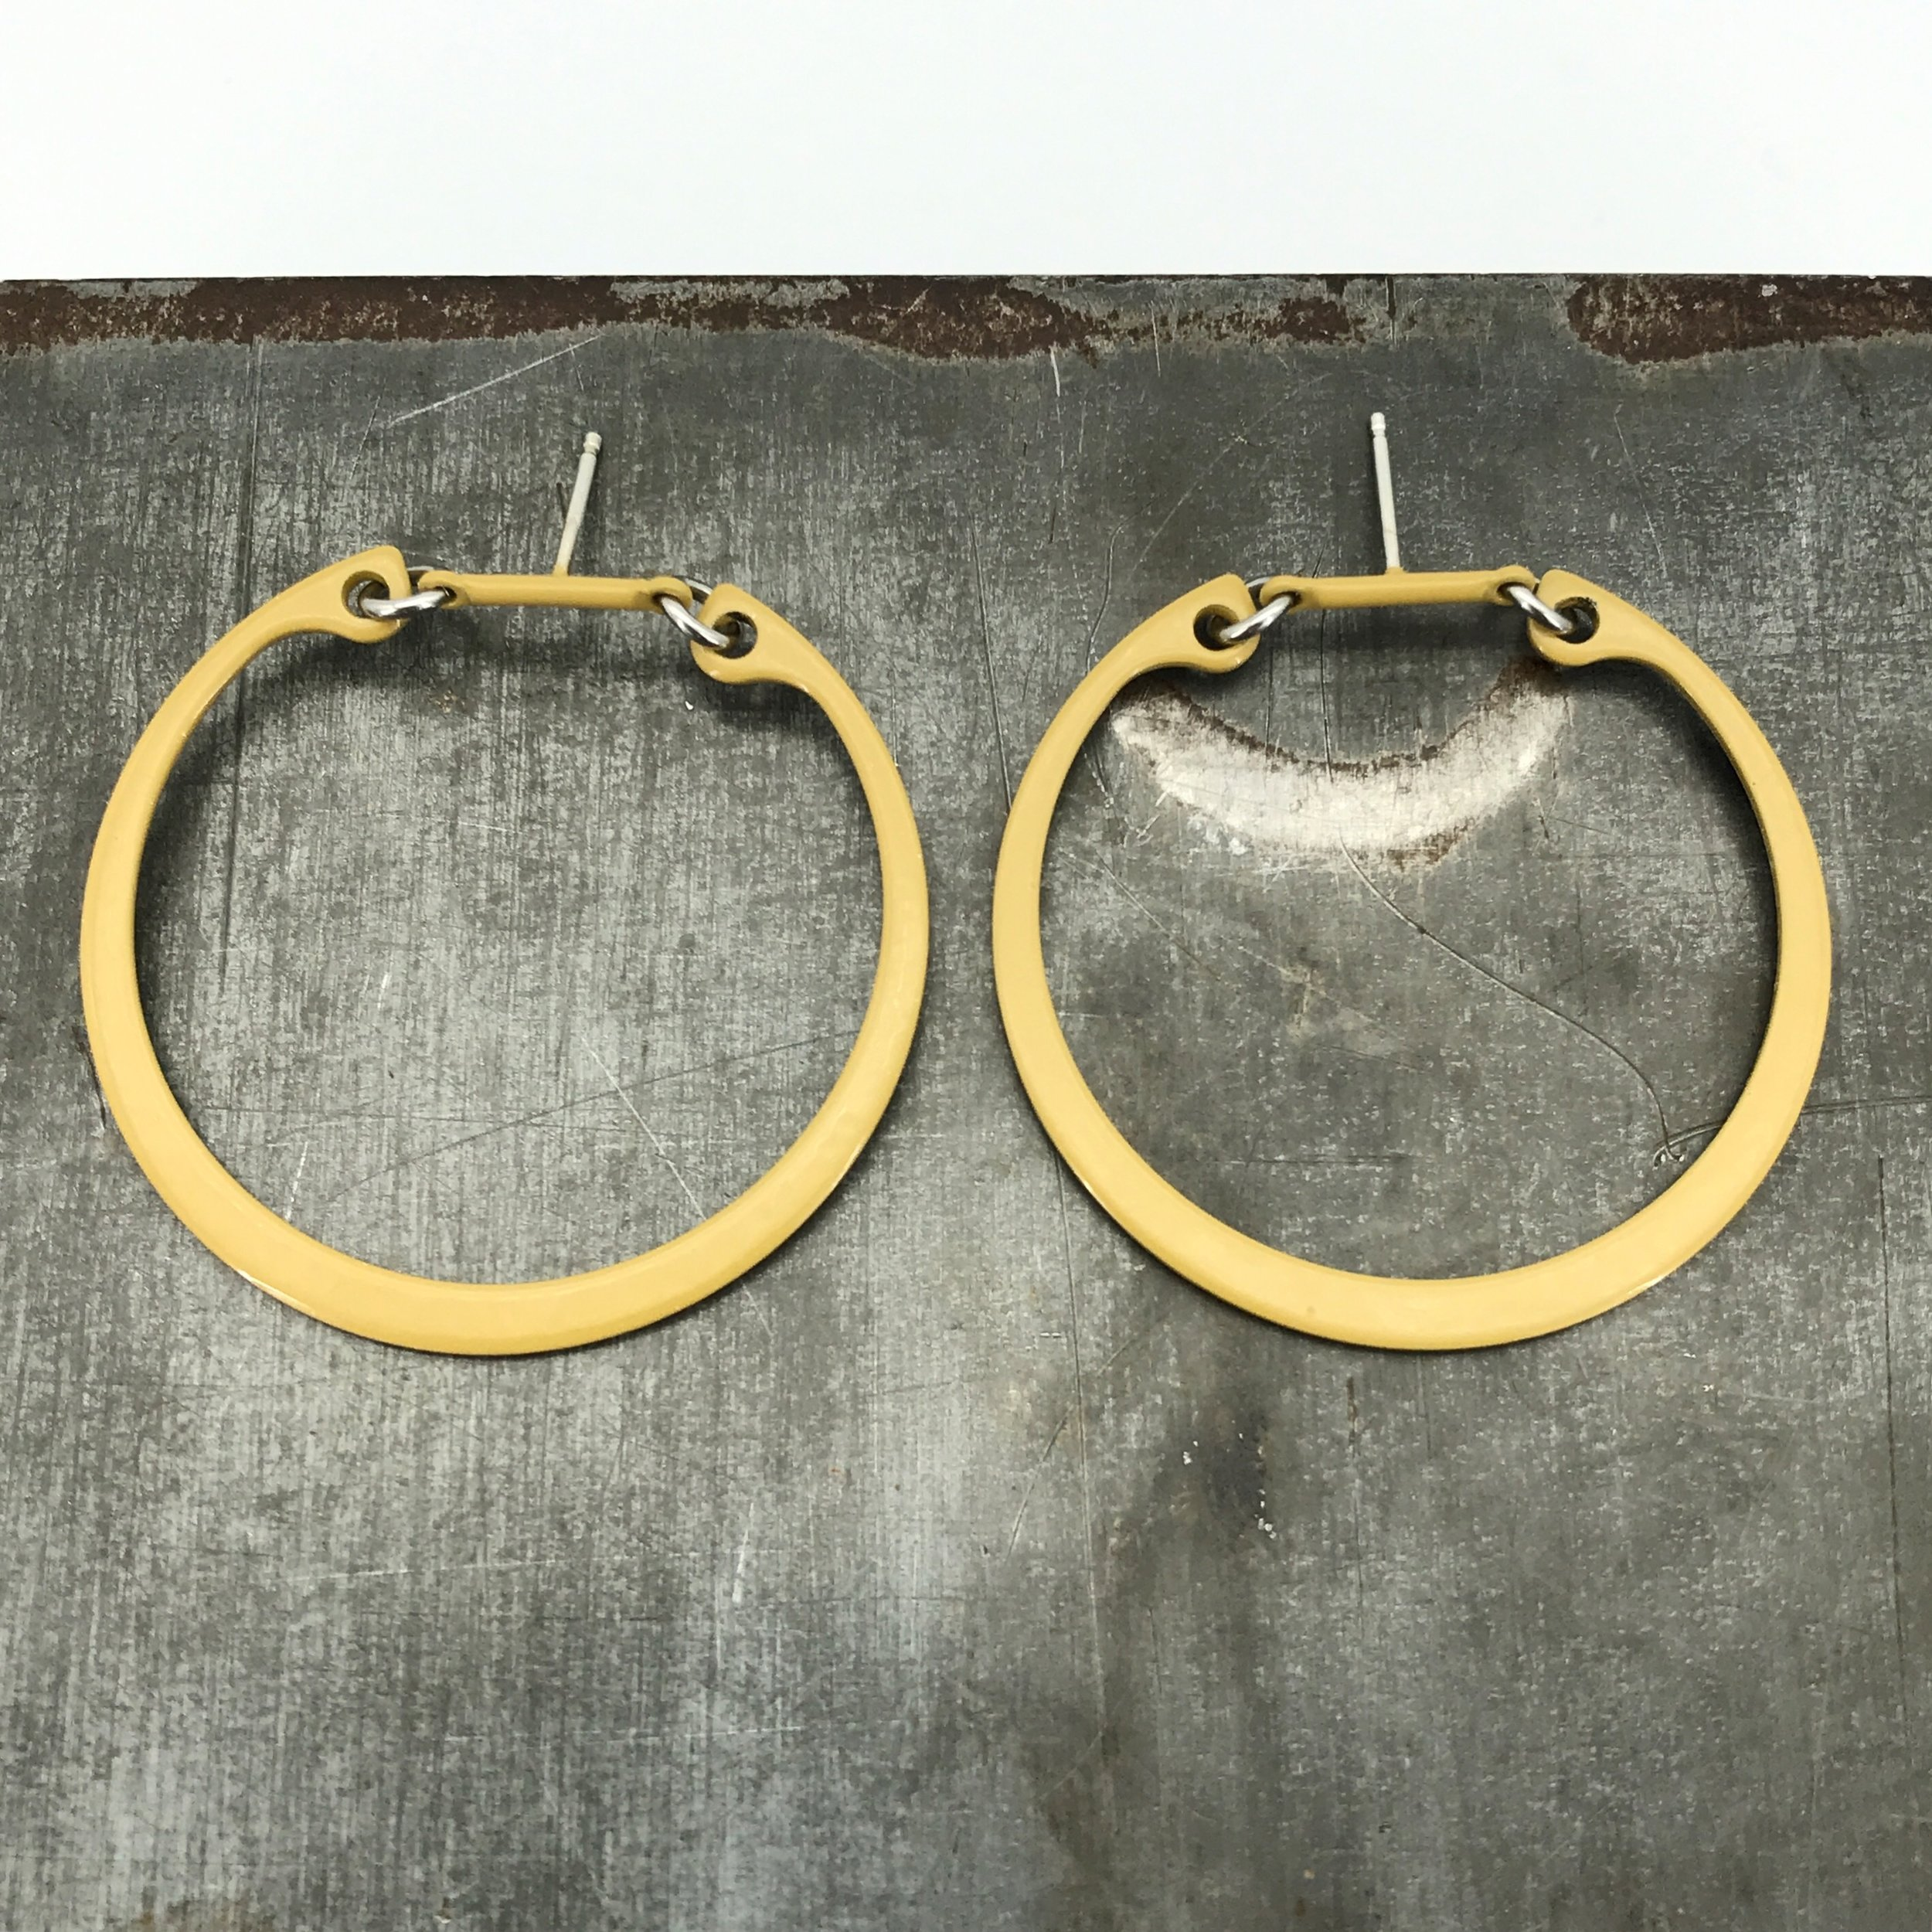 Industrial Hoop post earrings, lichen powder coated steel hoops with sterling silver posts, $70